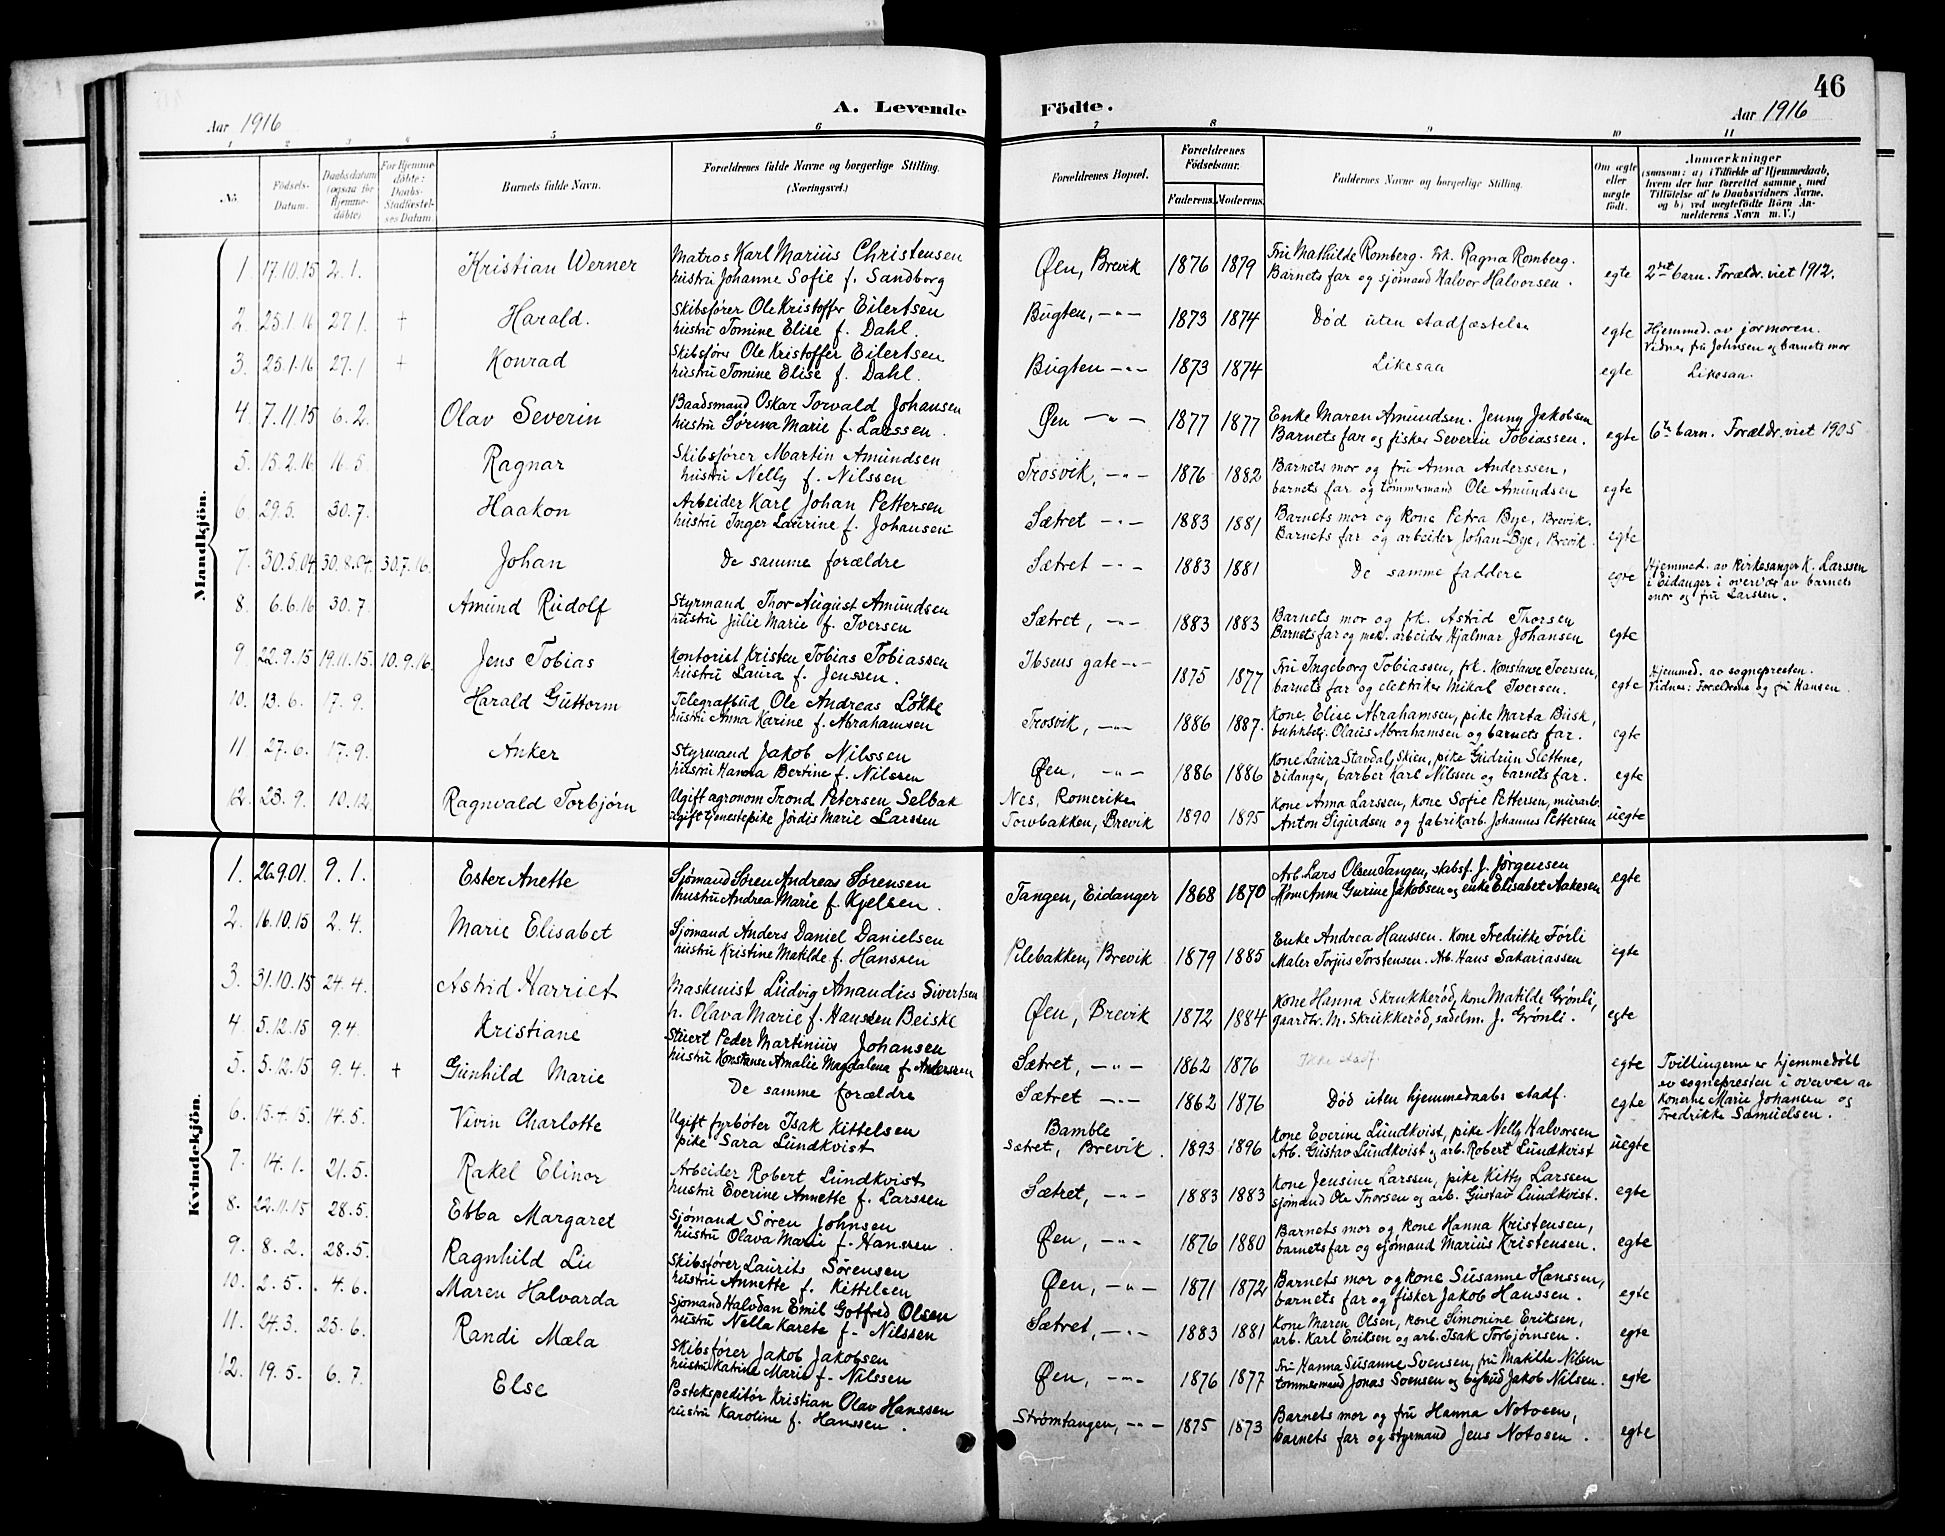 SAKO, Brevik kirkebøker, G/Ga/L0005: Klokkerbok nr. 5, 1901-1924, s. 46